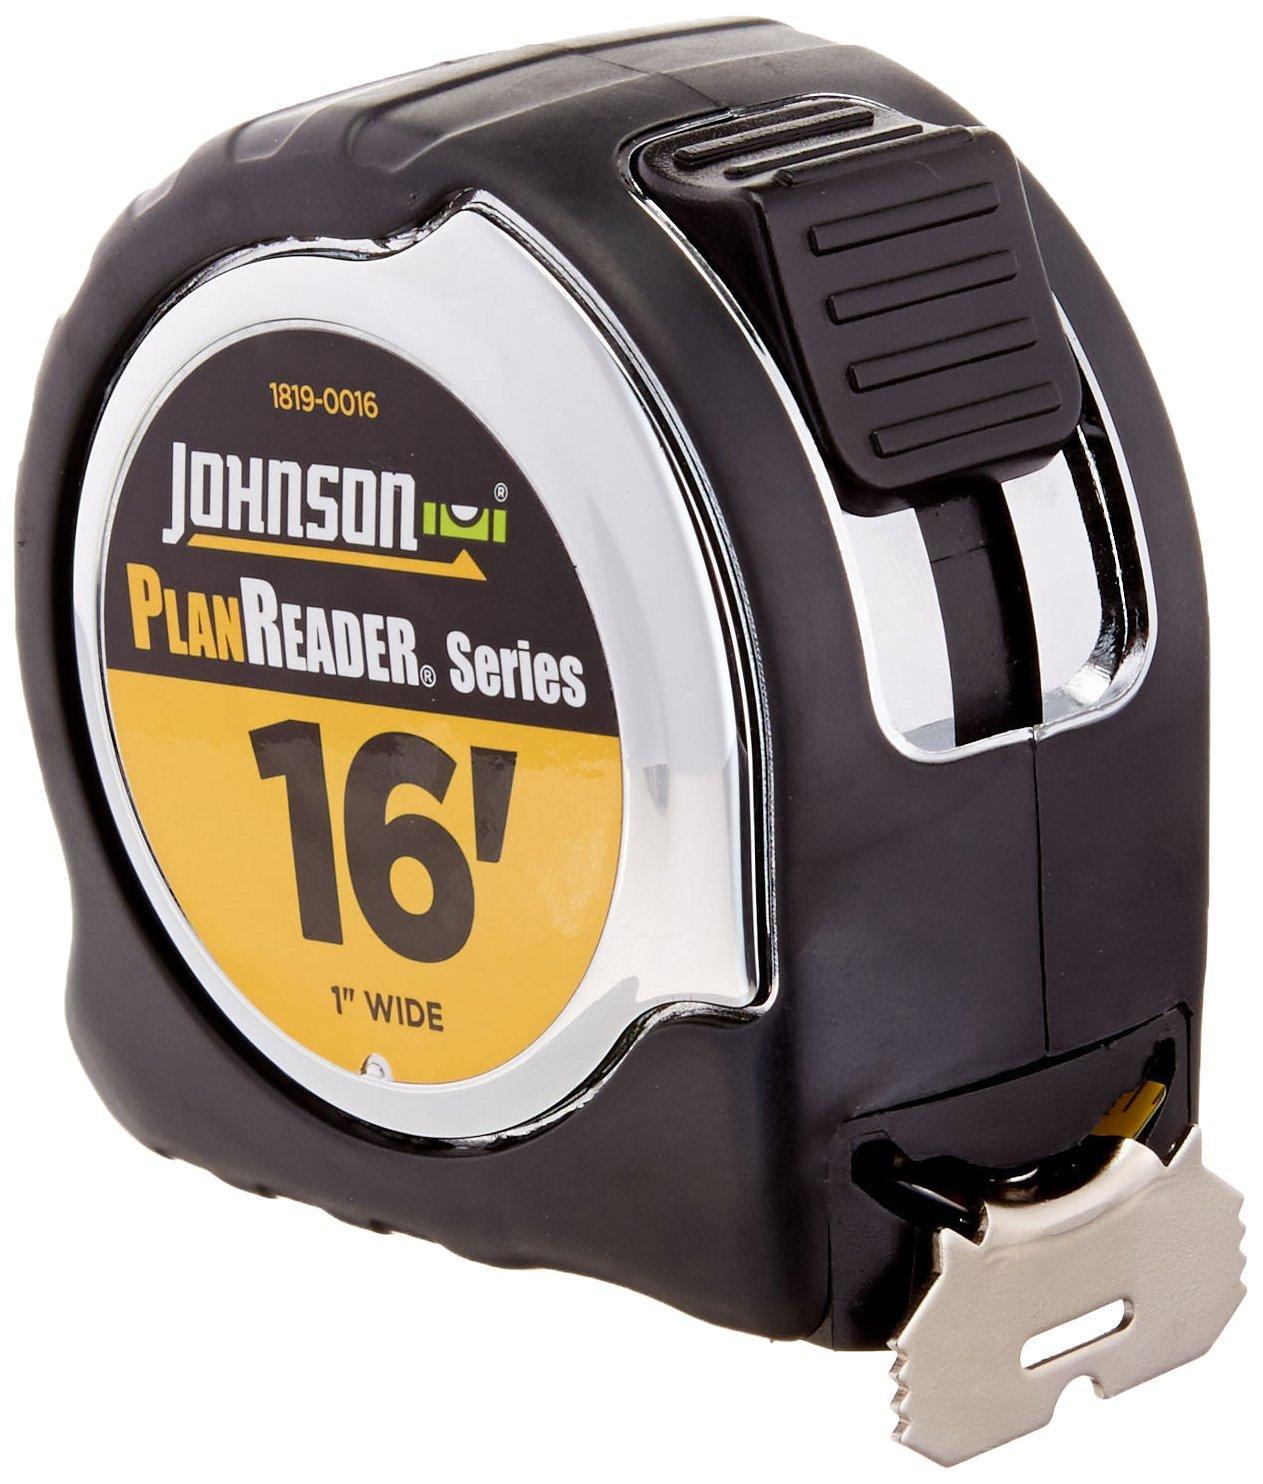 Johnson Level 1819-0016 16-Foot Plan Reader Power Tape, Black/Silver